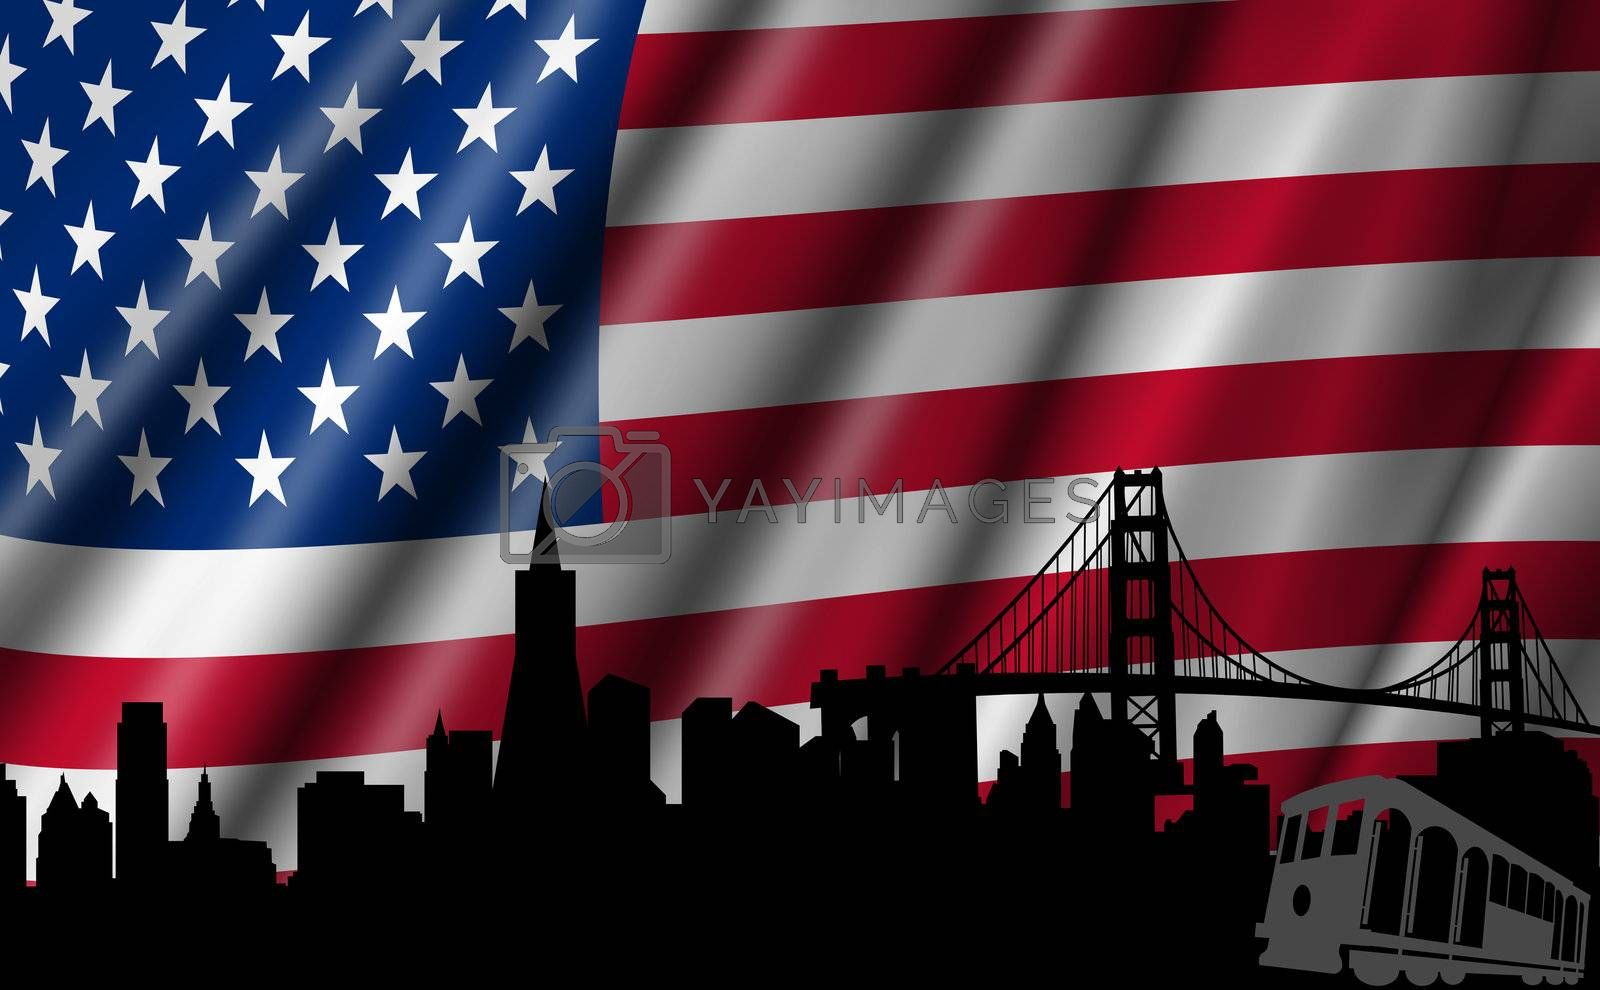 USA American Flag with Golden Gate Bridge San Francisco Skyline Silhouette Illustration